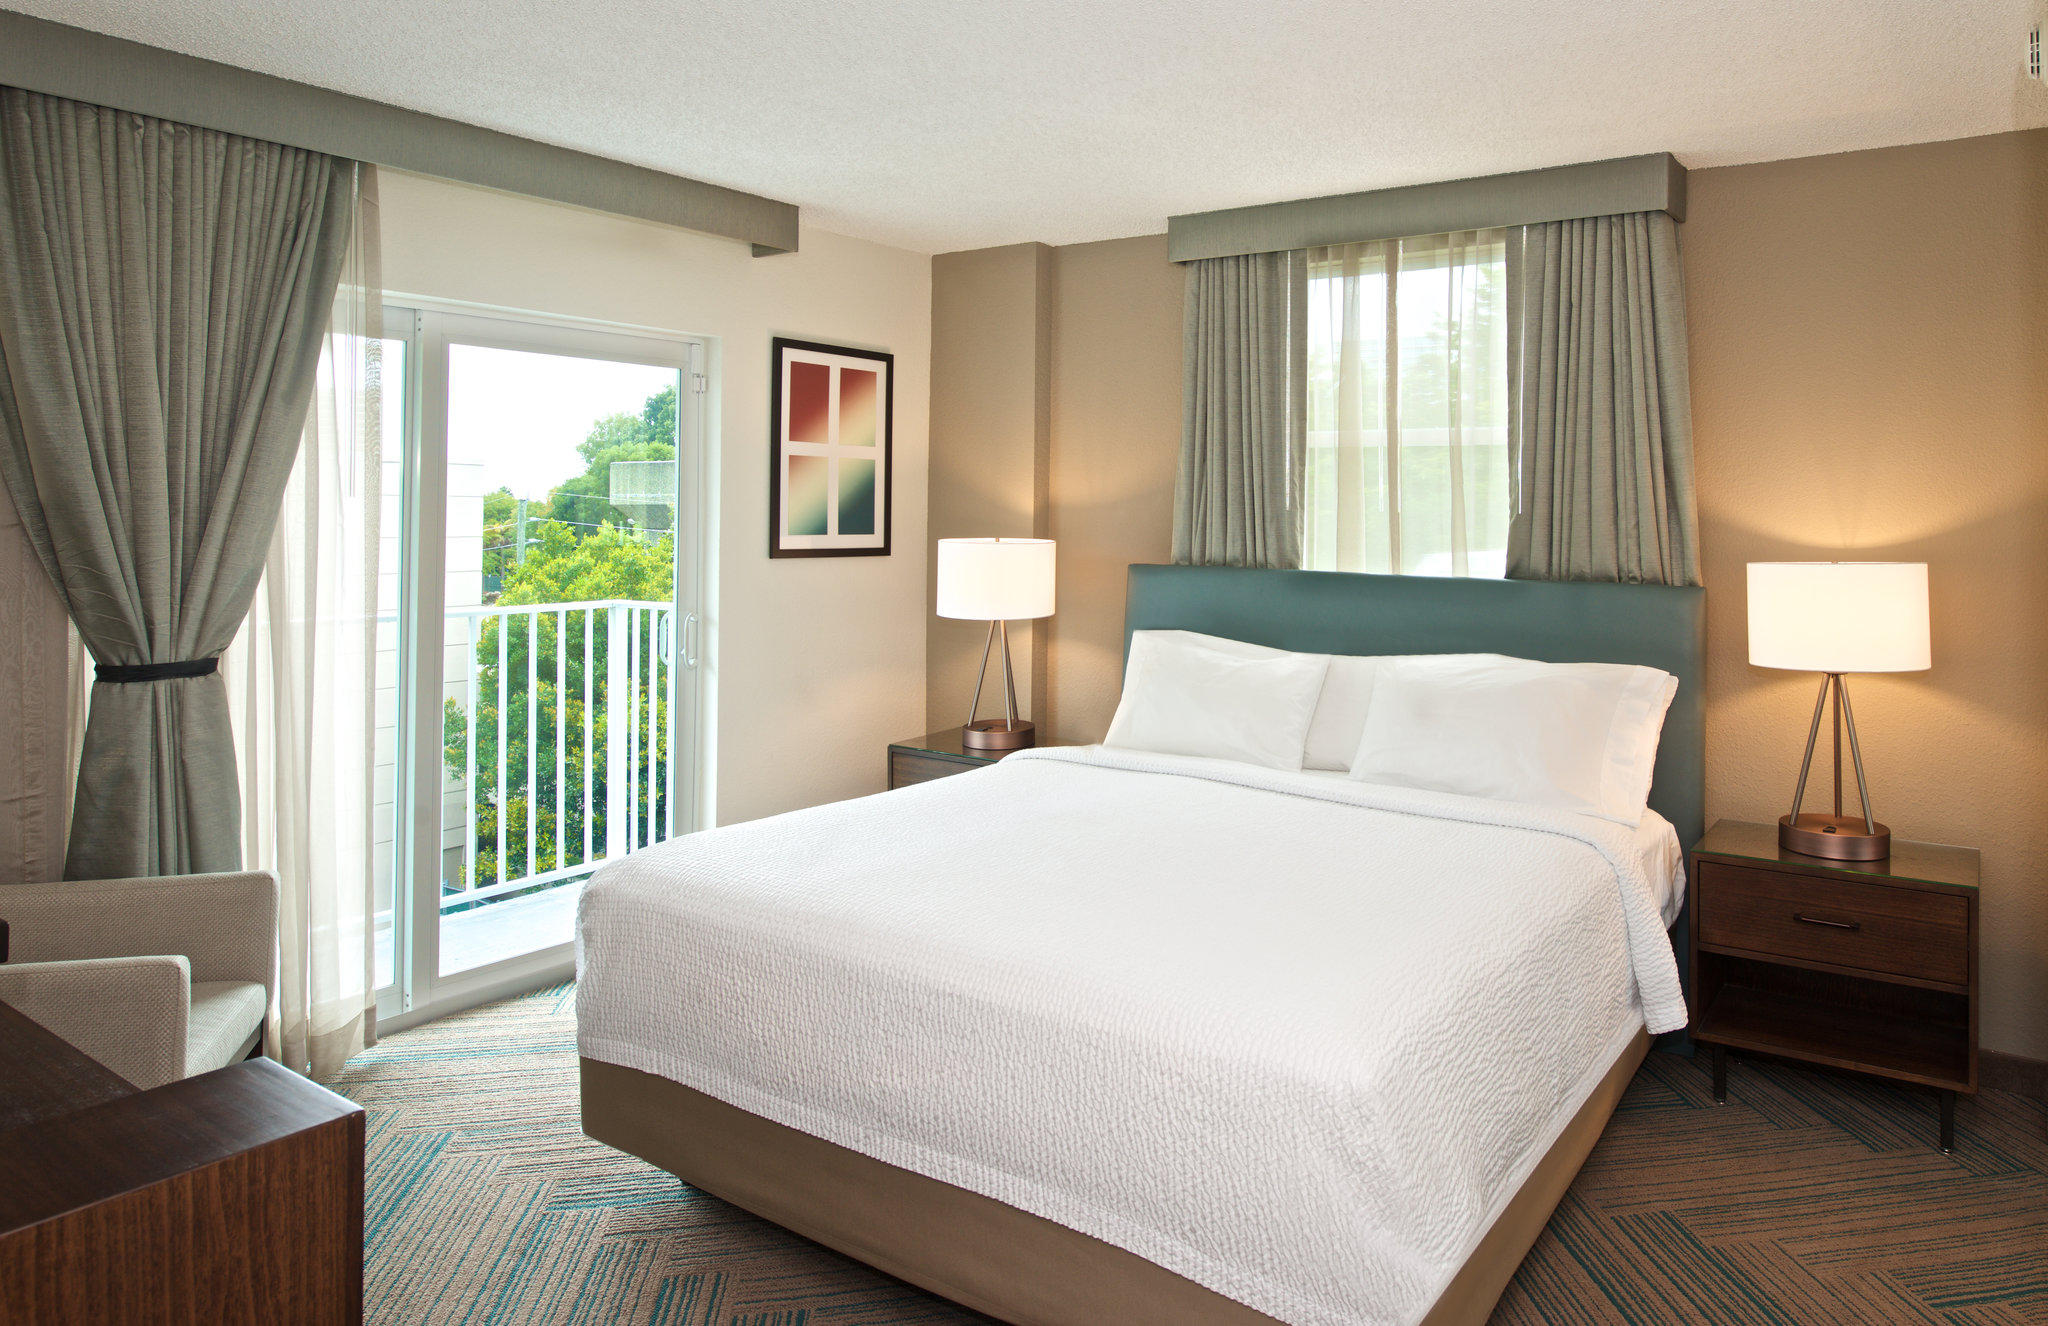 Residence Inn by Marriott Miami Coconut Grove